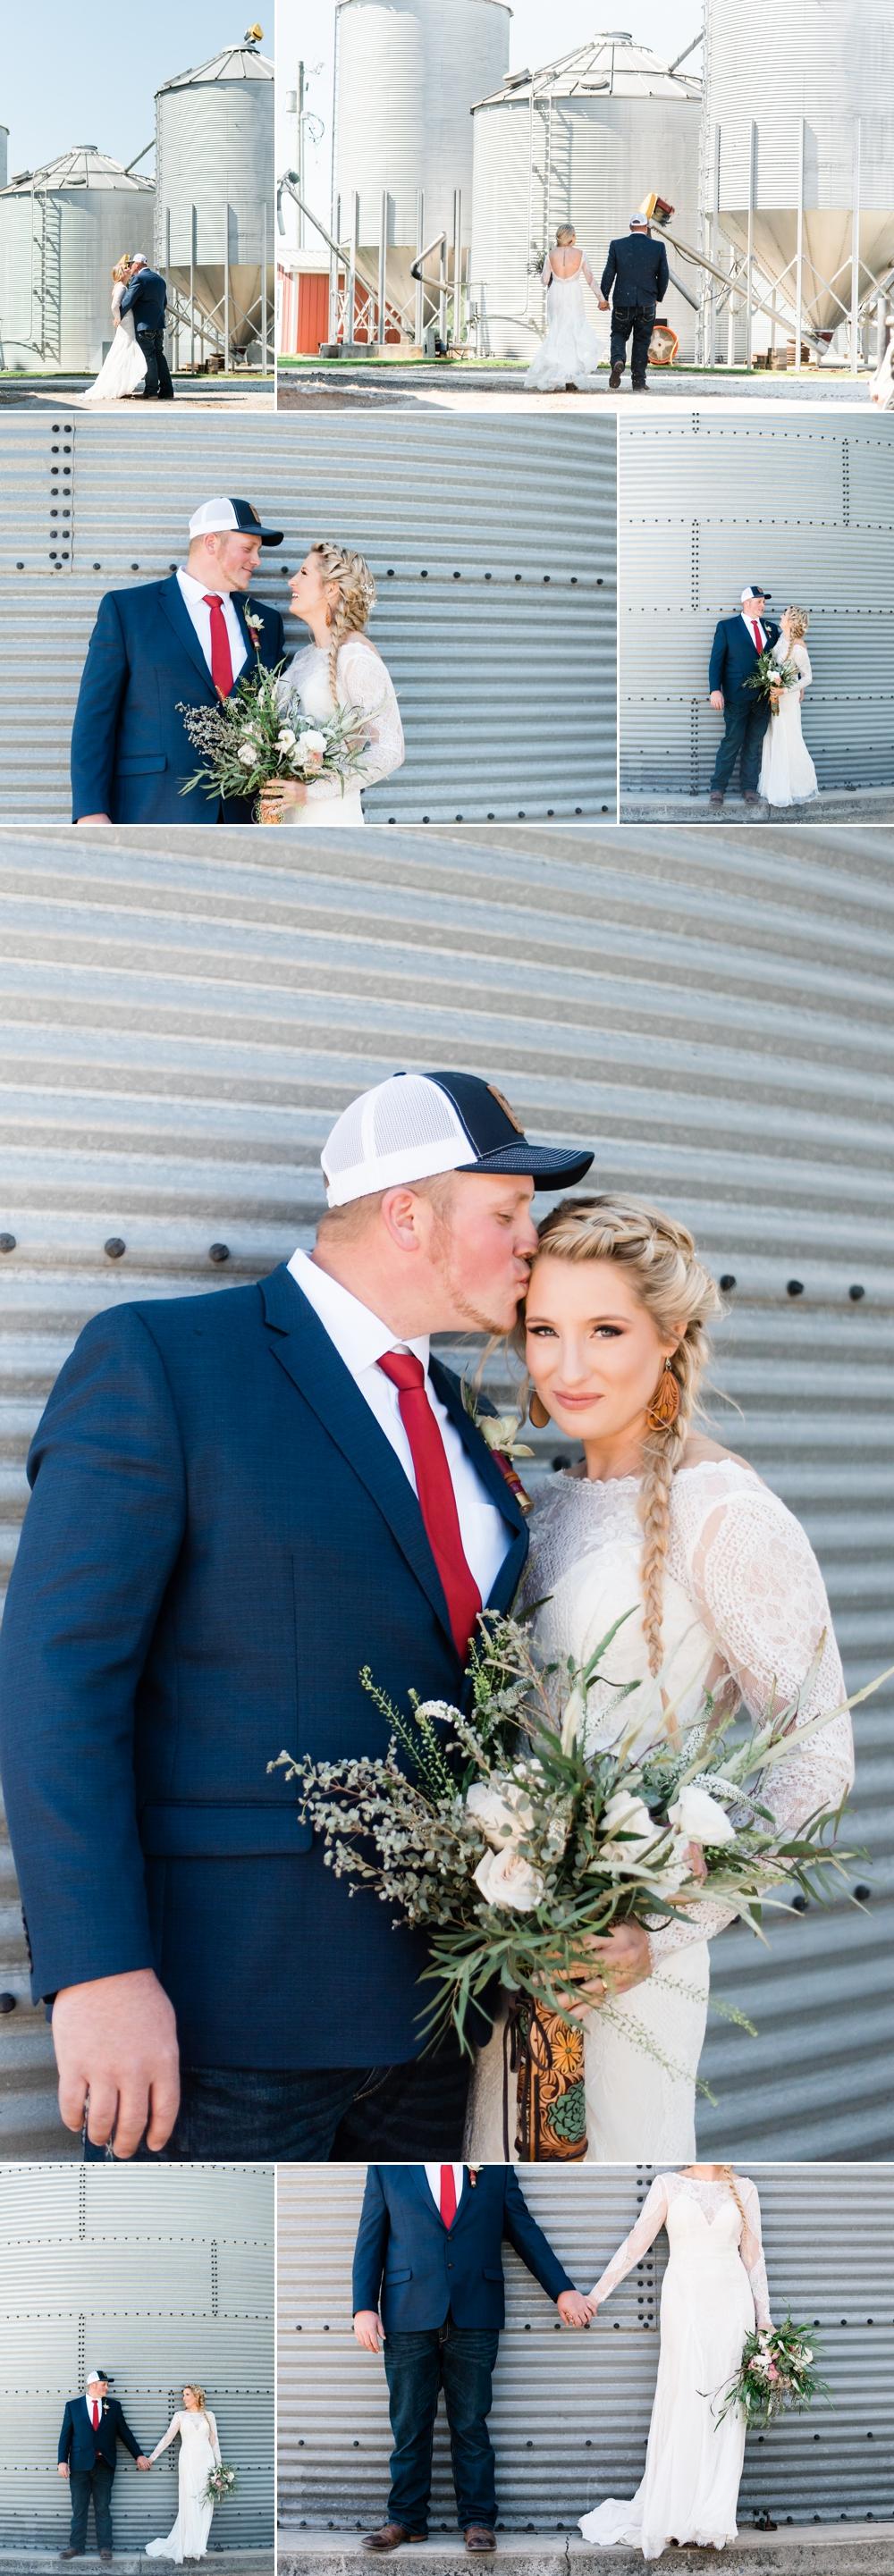 sickler wedding 8.jpg